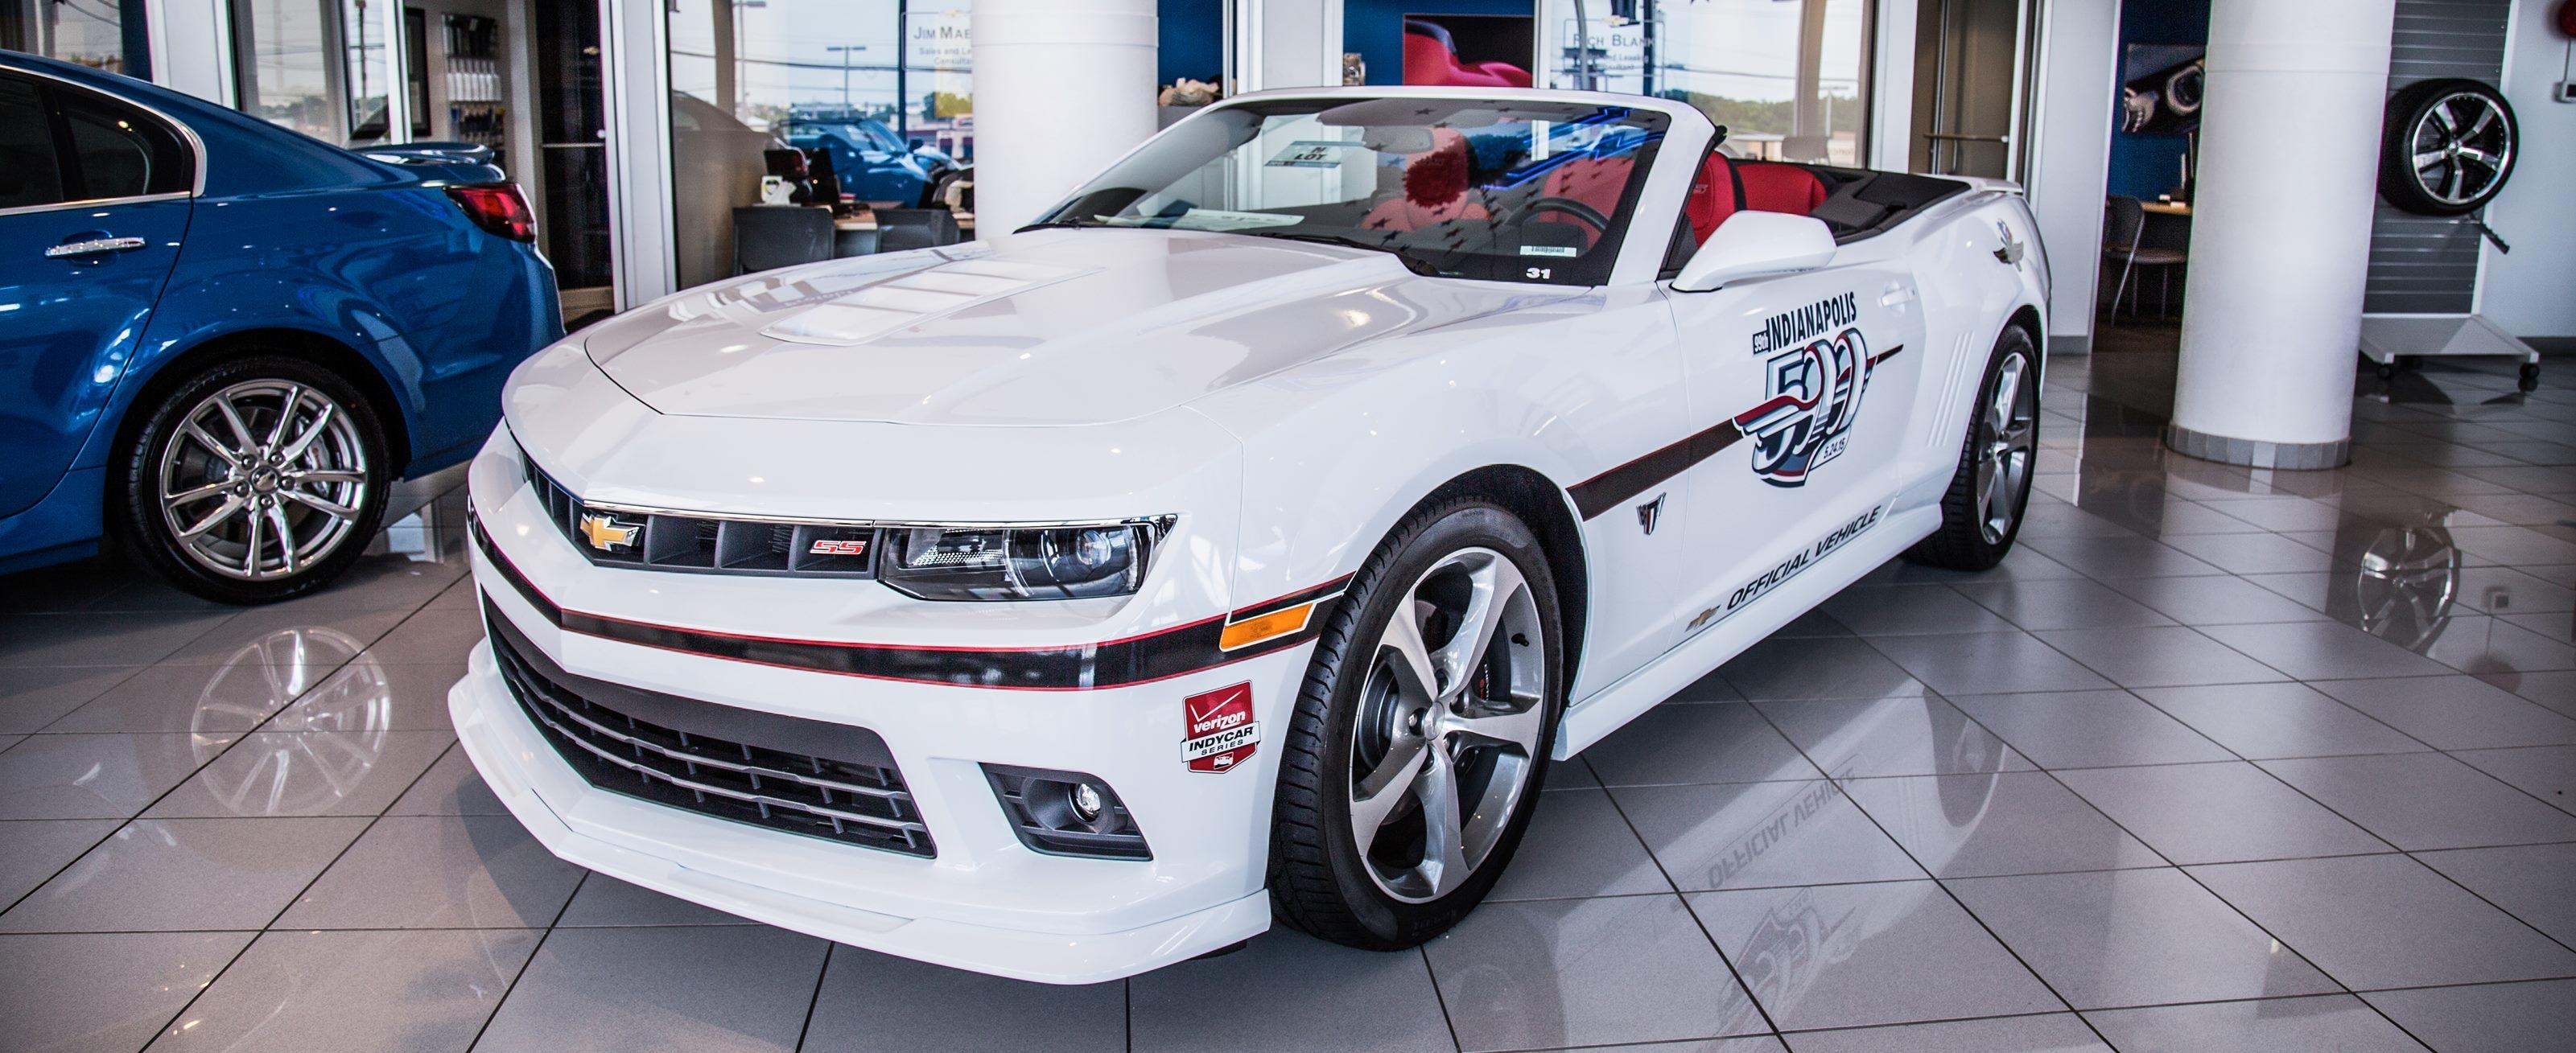 Mazda Dealers Cincinnati >> Jake Sweeney Chevrolet, Cincinnati Ohio (OH) - LocalDatabase.com